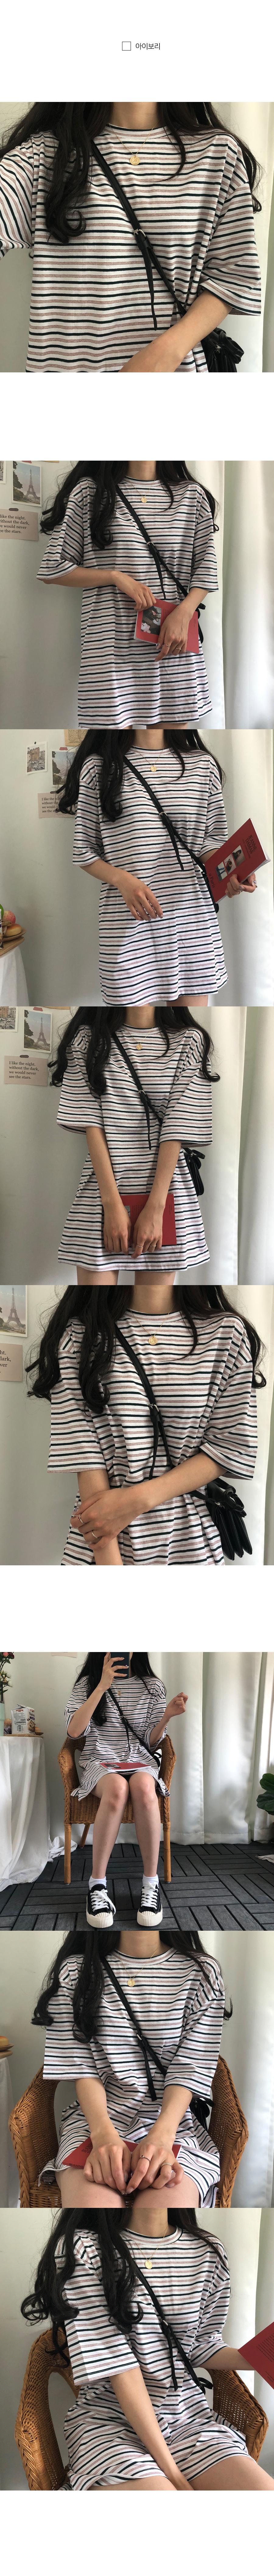 Crayon dangara mini dress